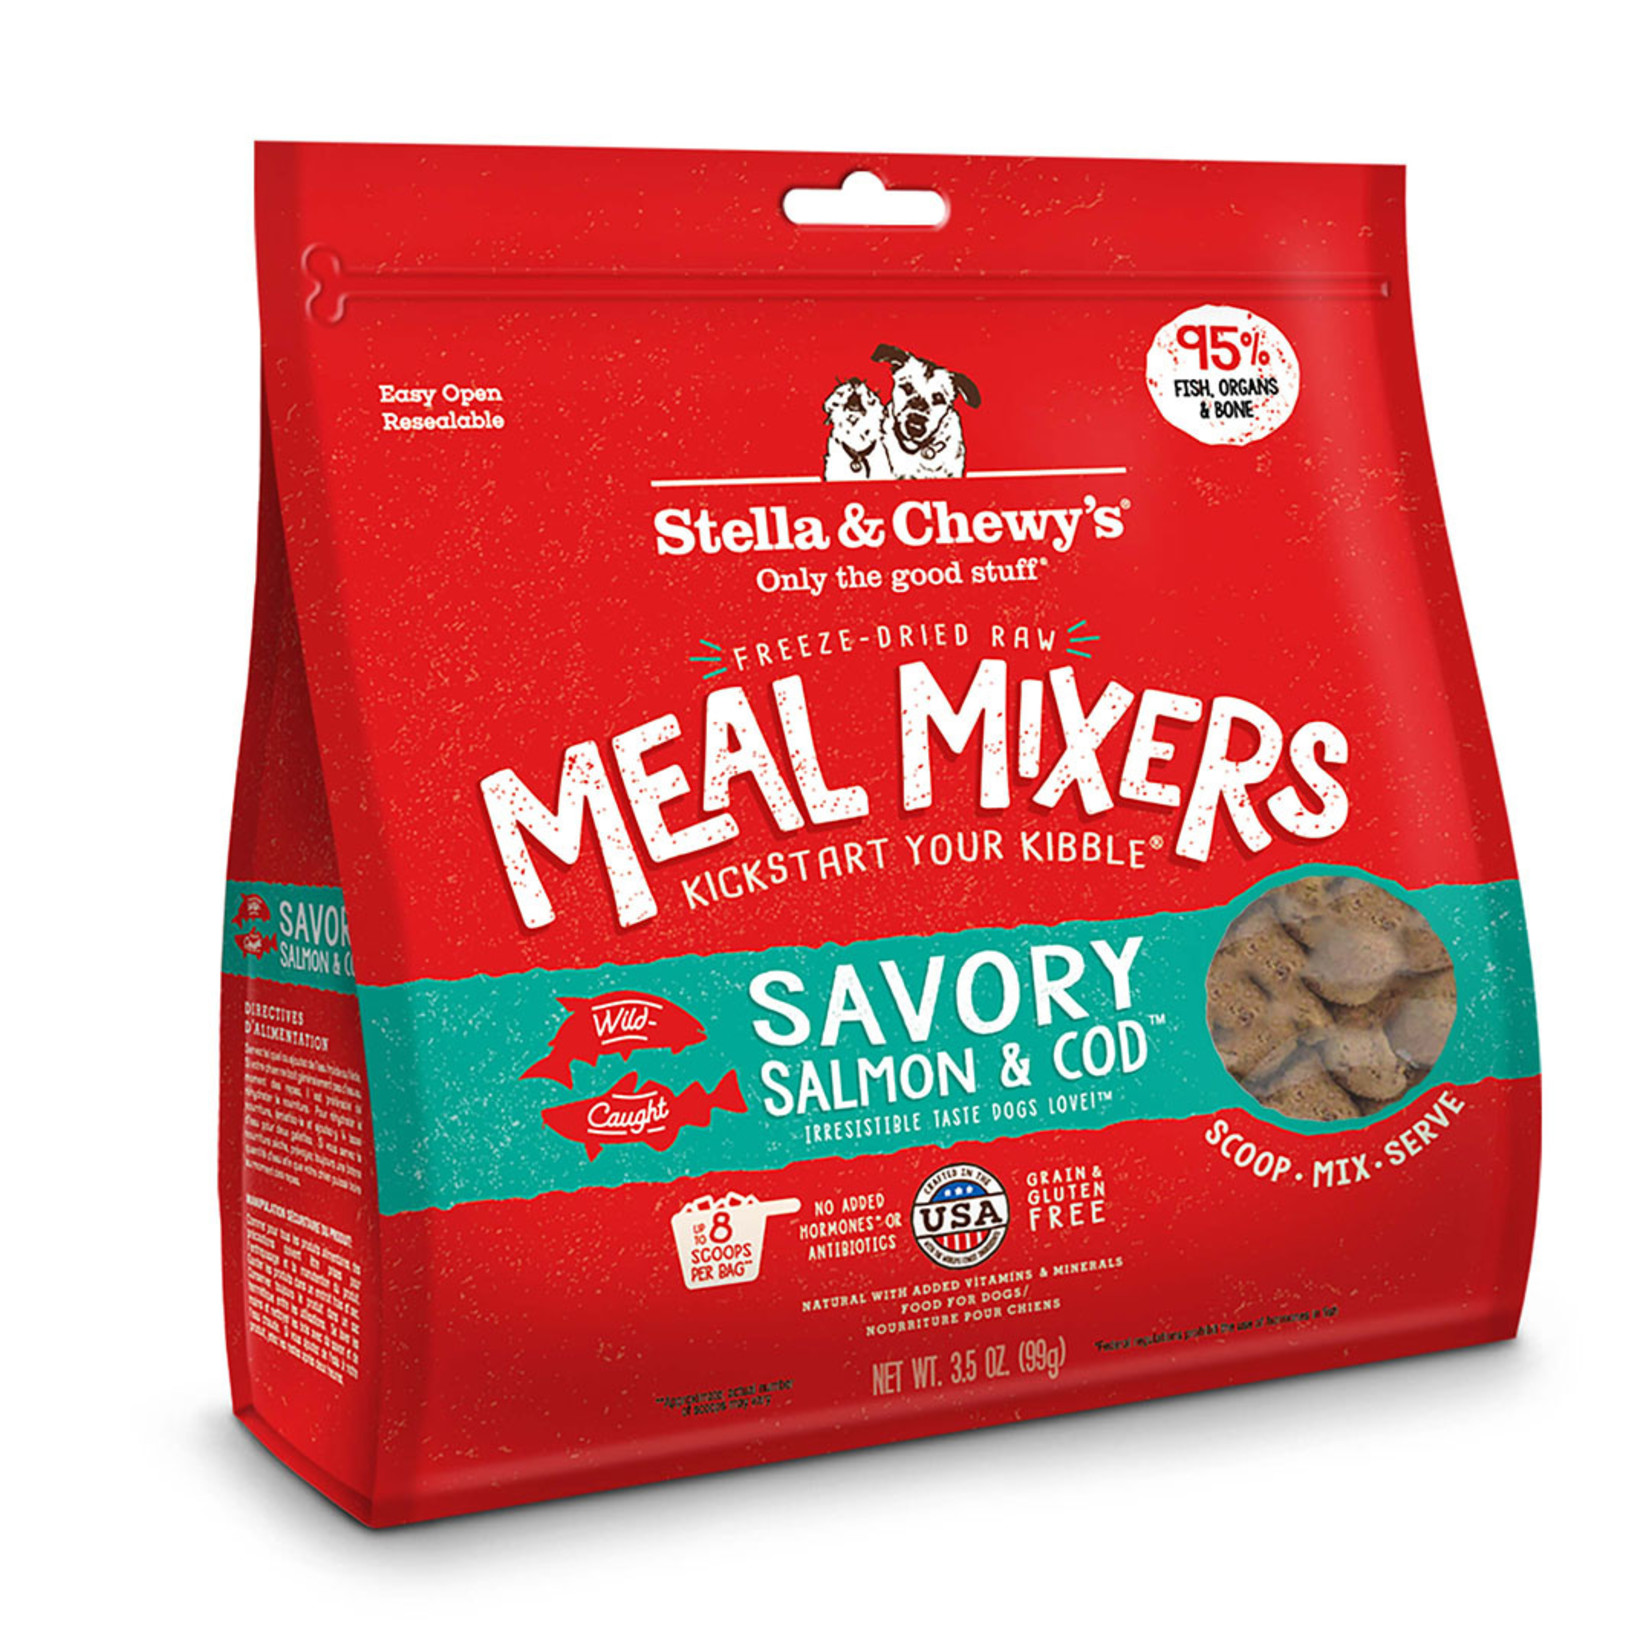 Stella & Chewys Stella Freeze-Dried Dog Meal Mixers Salmon & Cod 18 OZ